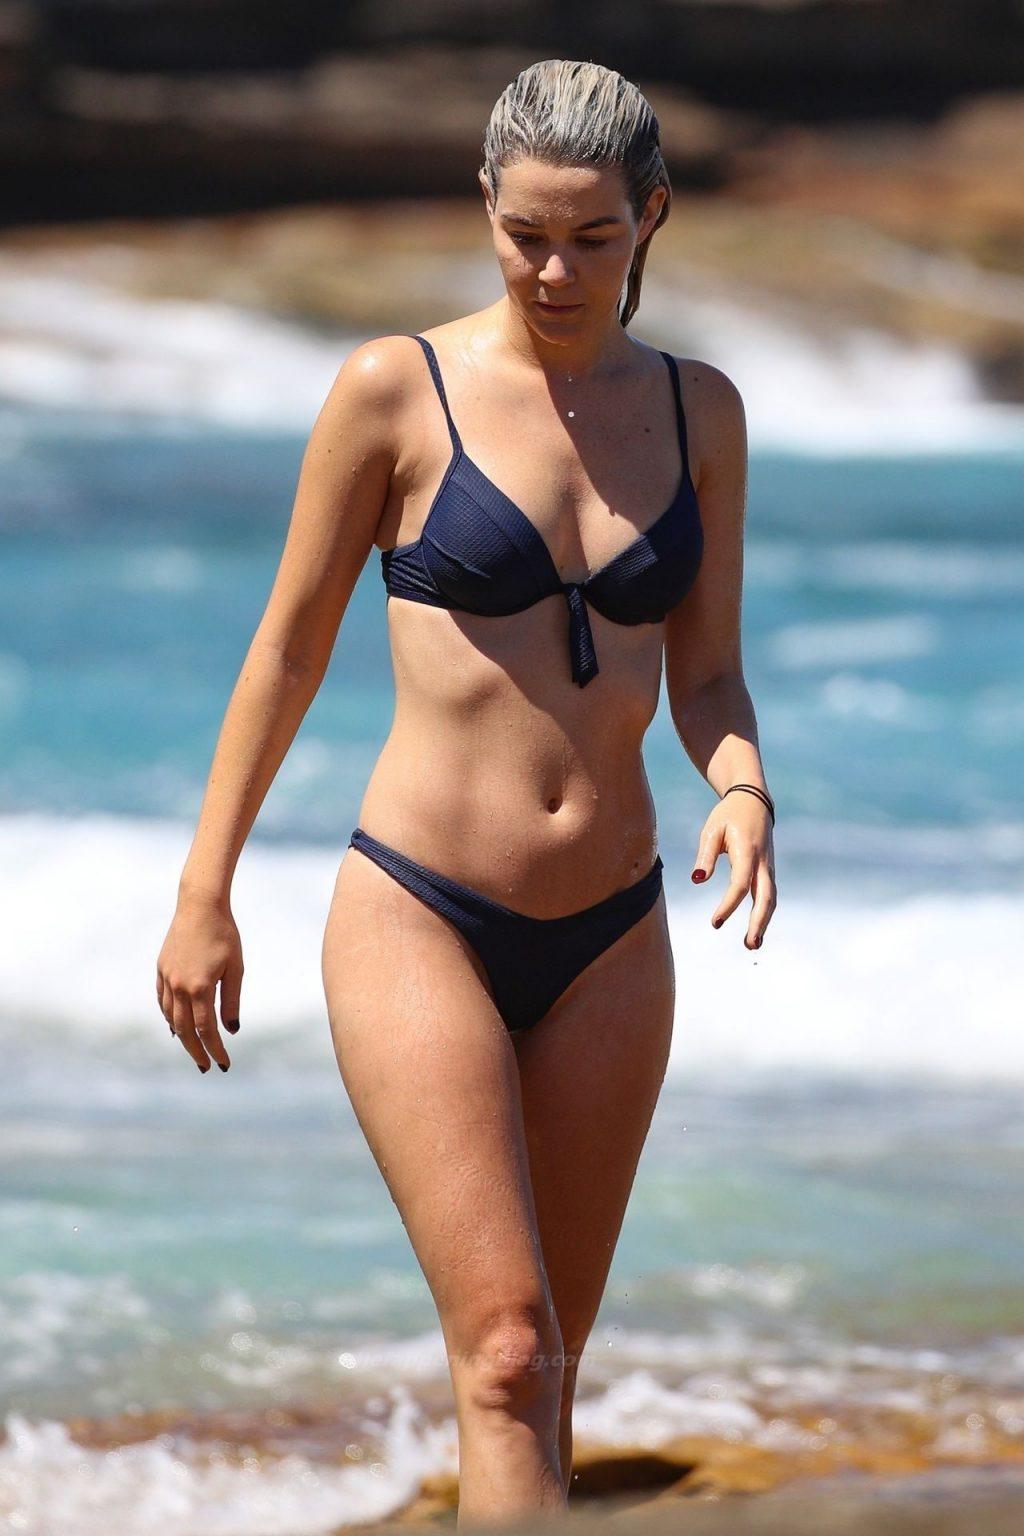 Helena Sauzier is Pictured at Tamarama Beach in Sydney (60 Photos)